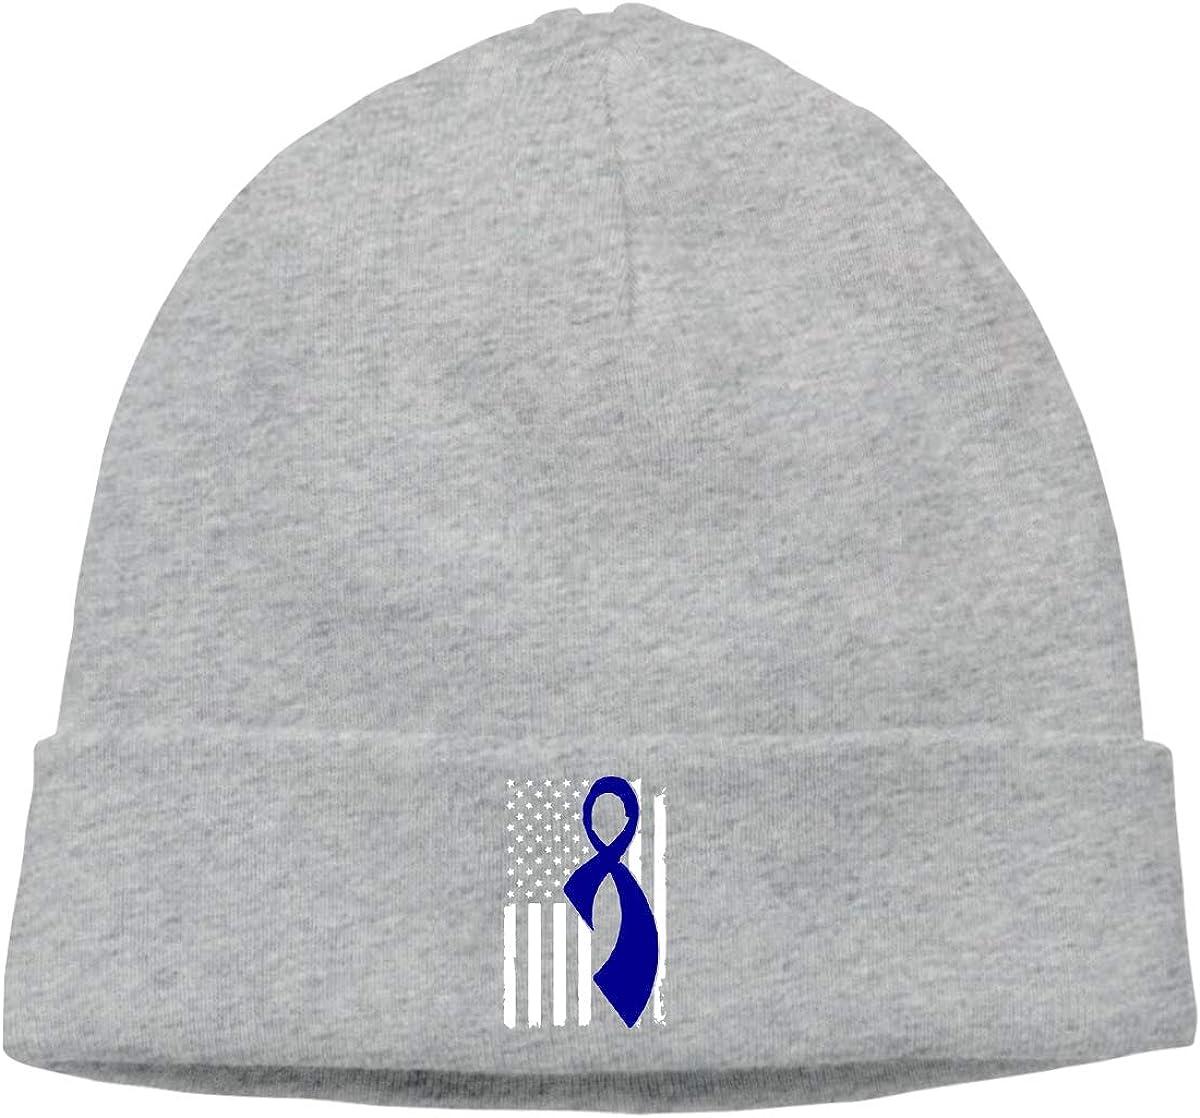 Colon Cancer Awareness Flag Toboggan Cap,Unisex Fashion Hipster Beanie Cap/&Hip-hop Cap/&Set Head Cap/&Skull Cap